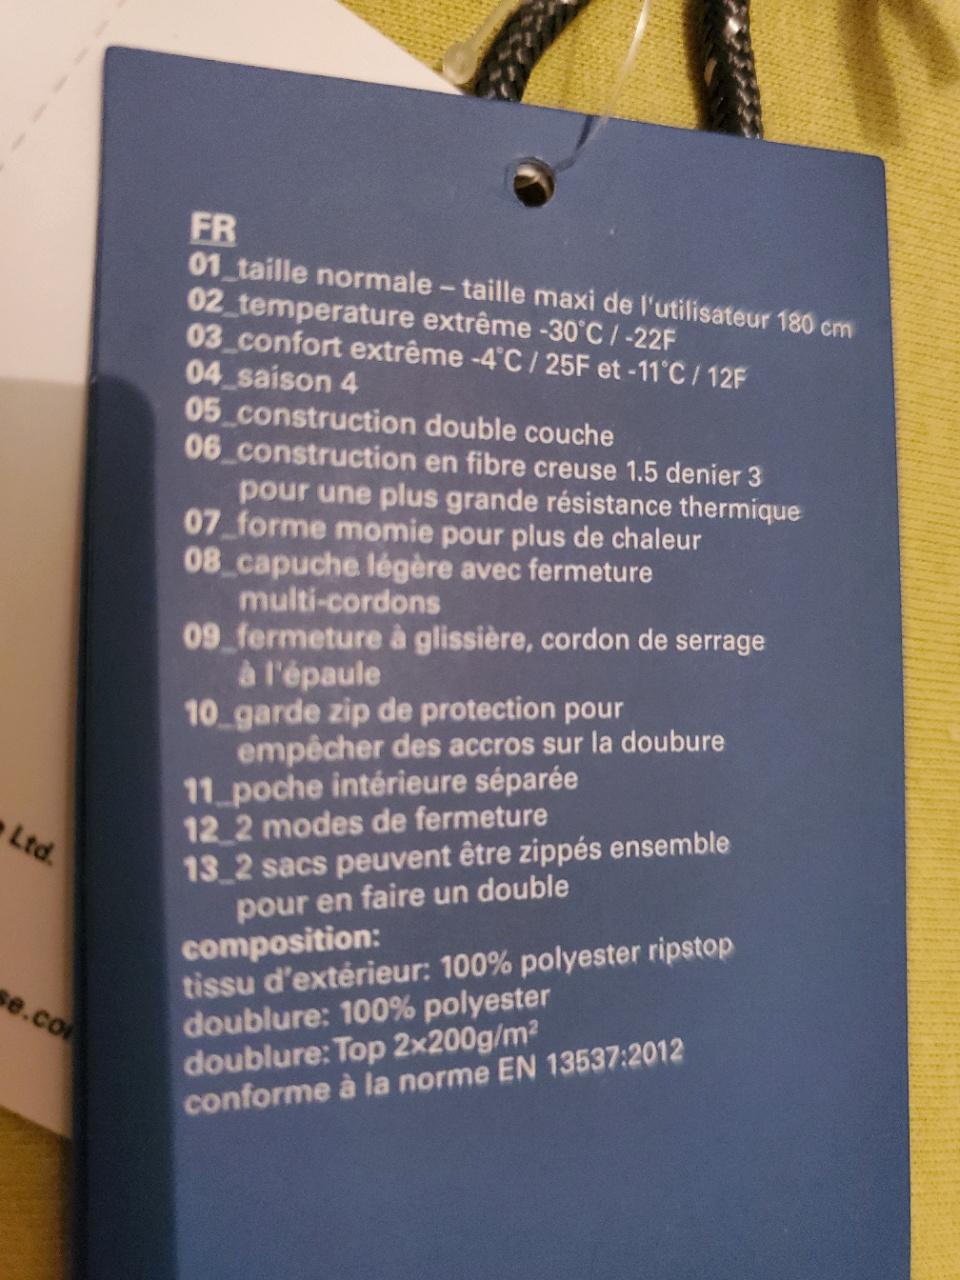 Retex sac de couchage Moutain Warehouse Microlite 1400 20200210